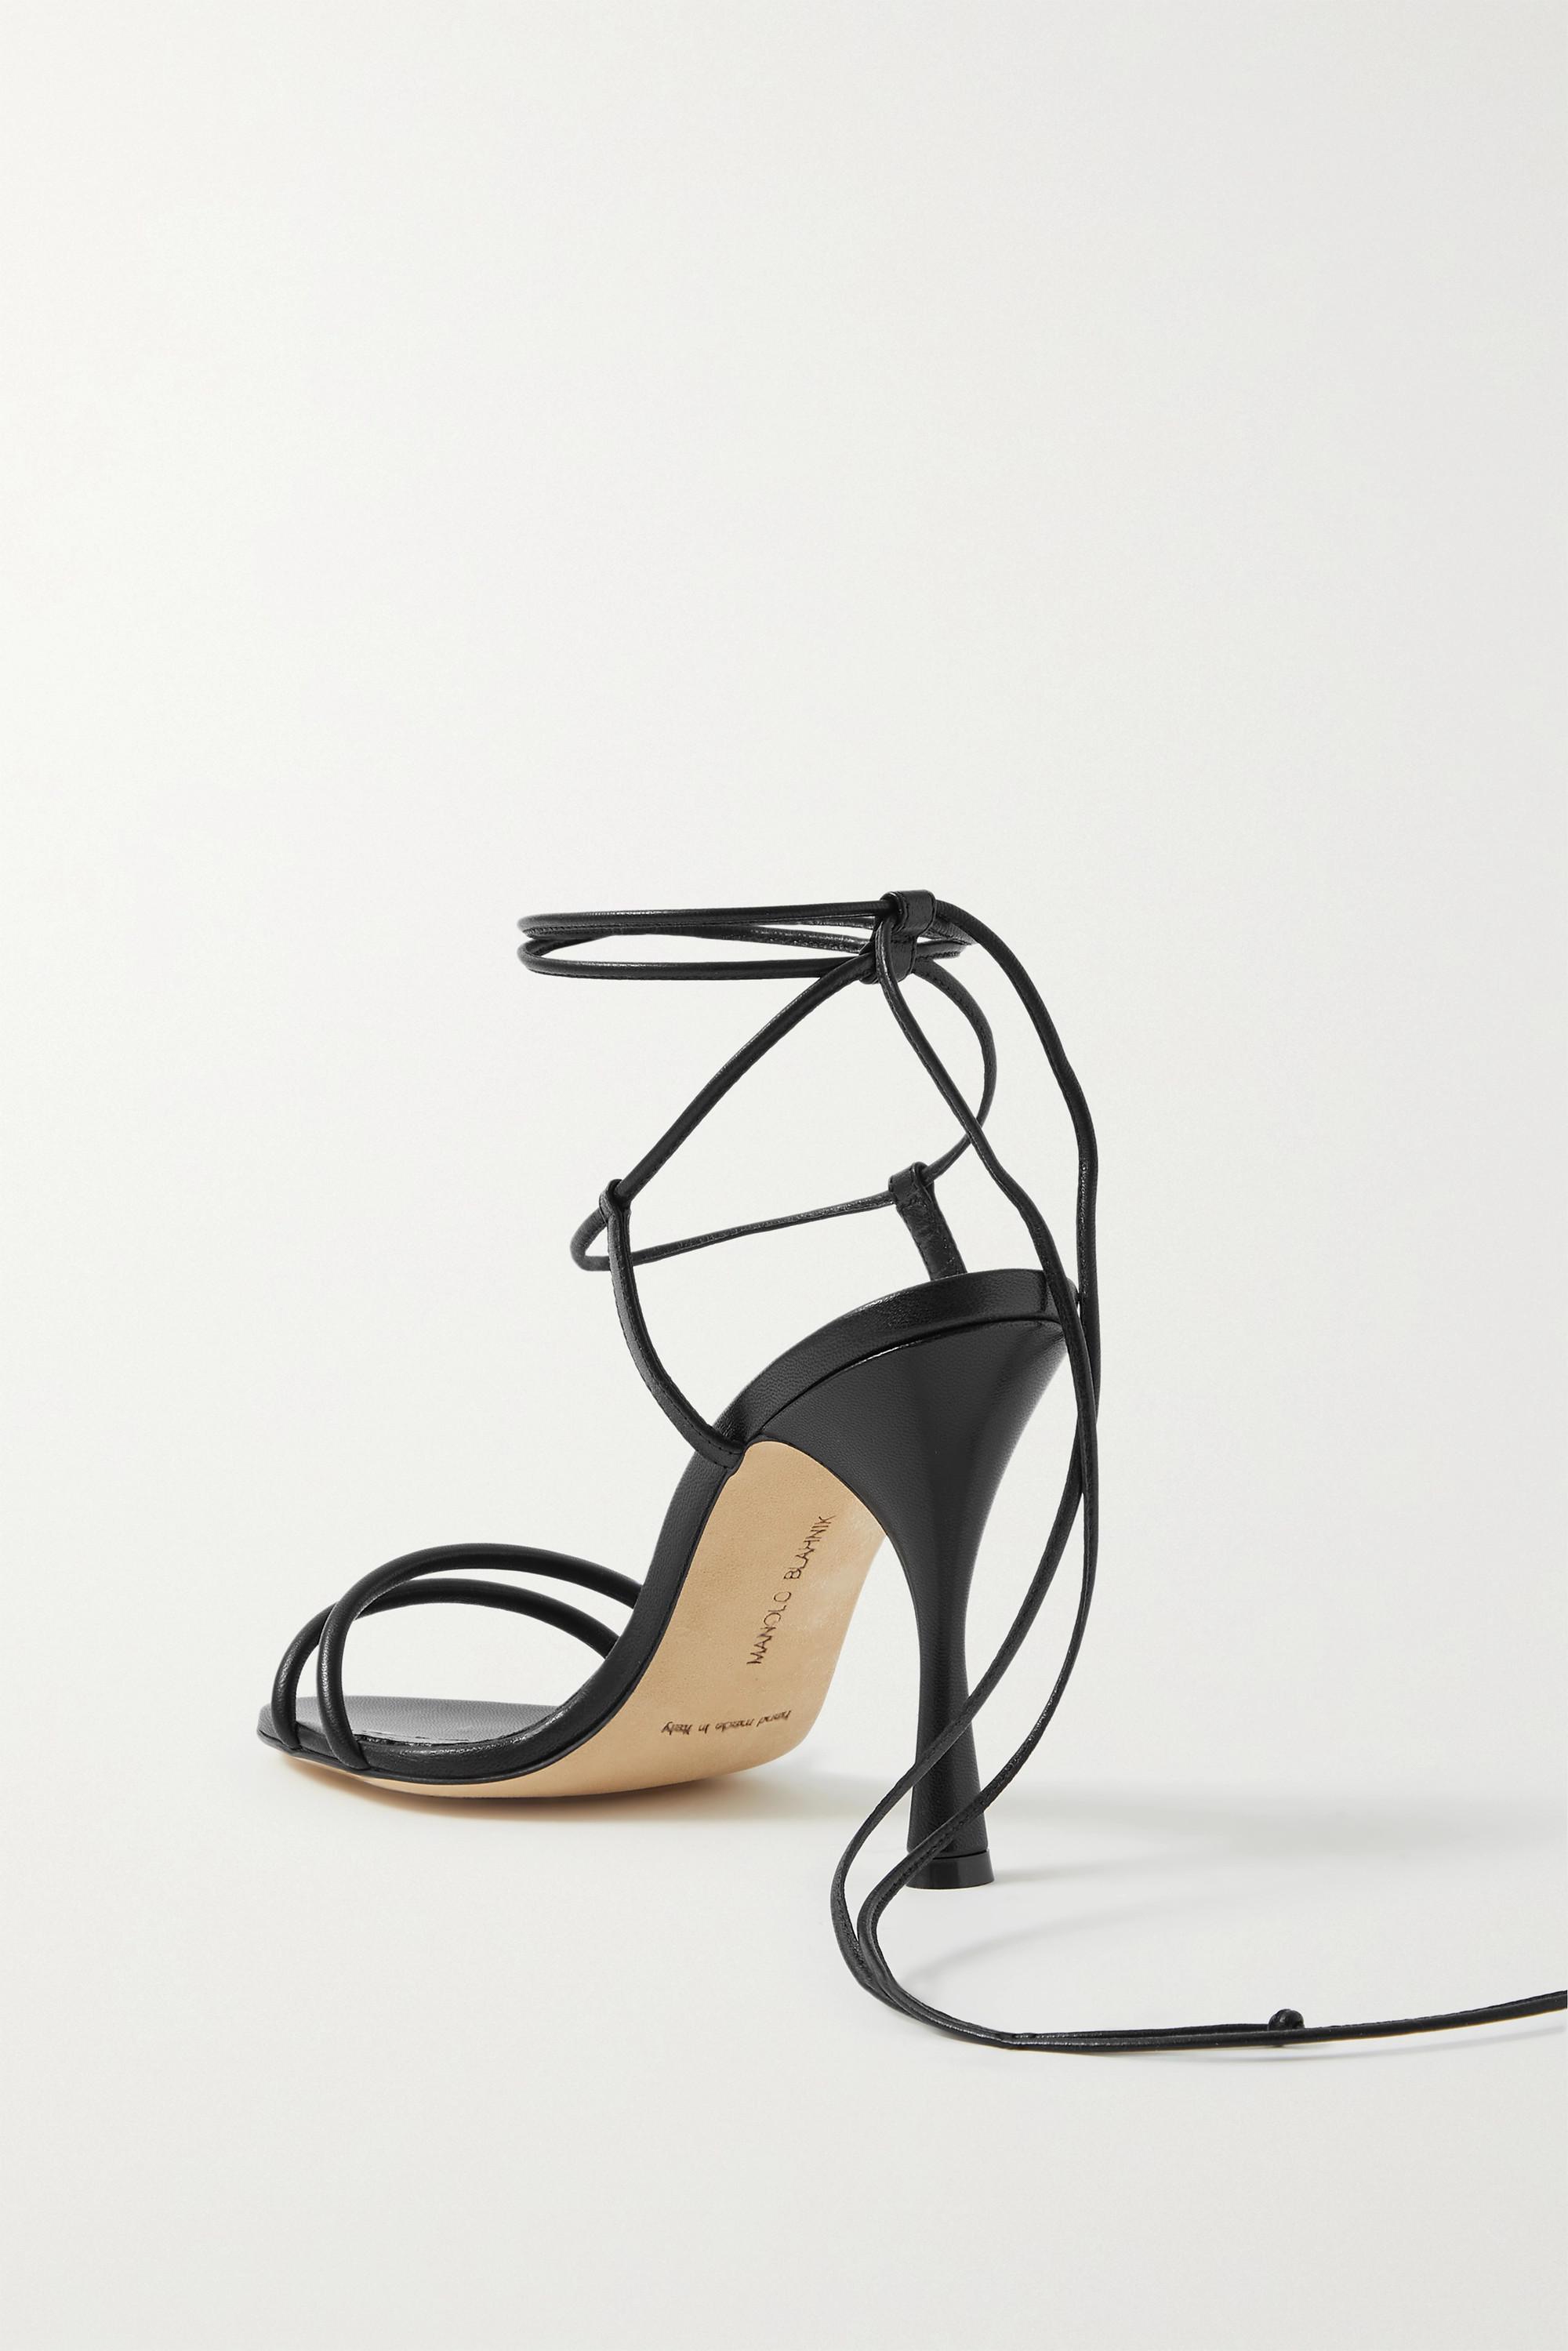 Manolo Blahnik Cochisa 105 leather sandals